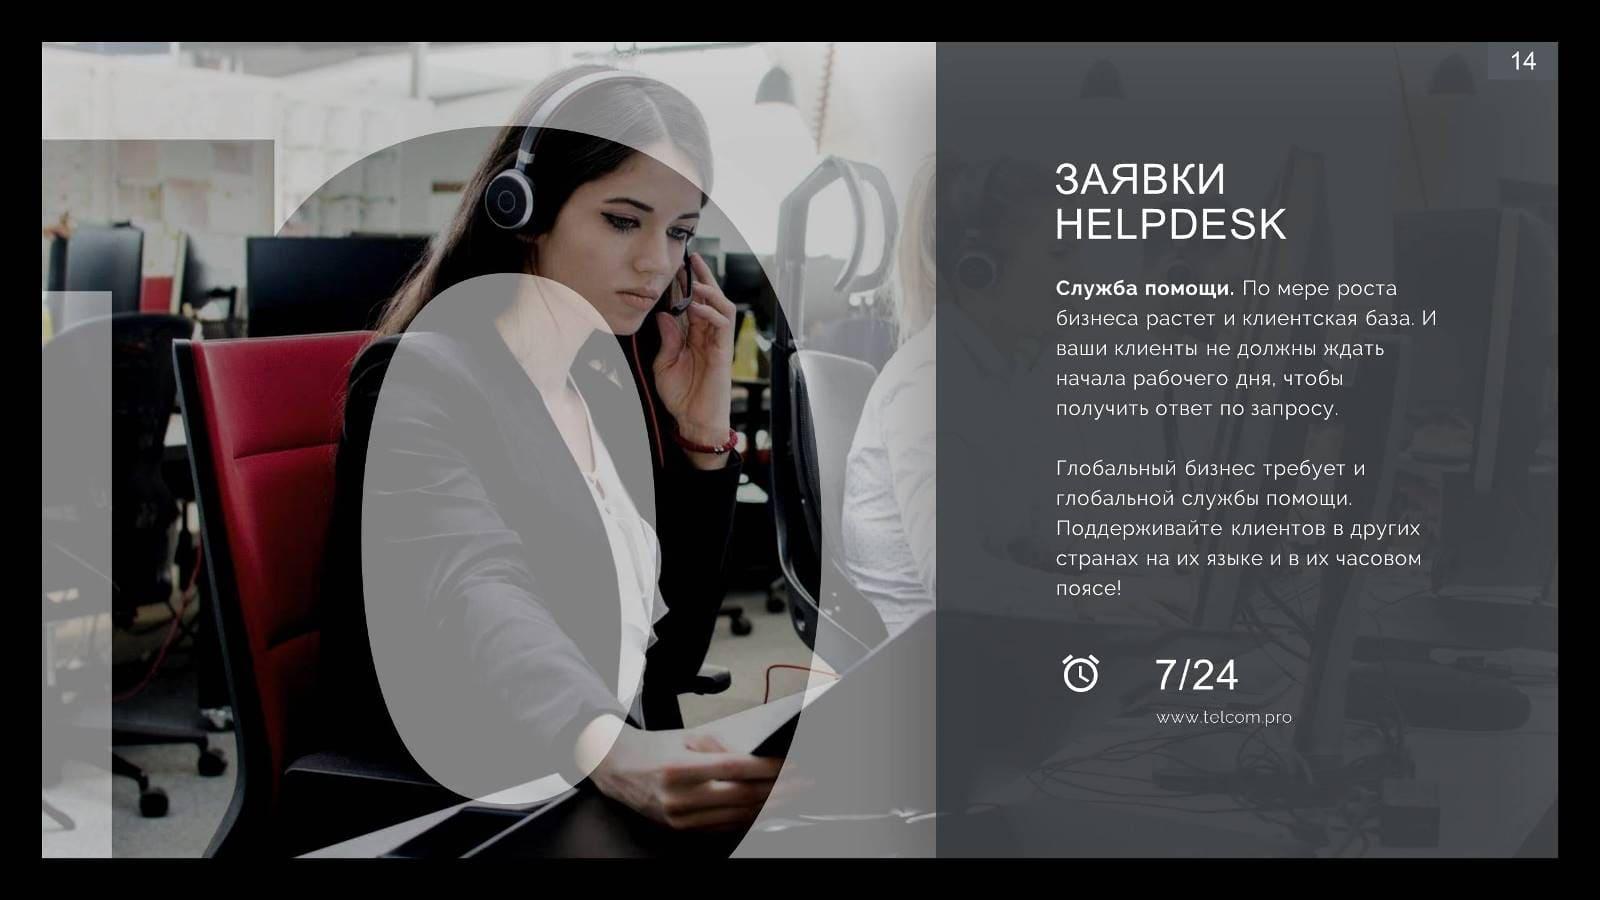 Облачная CRM Telcom